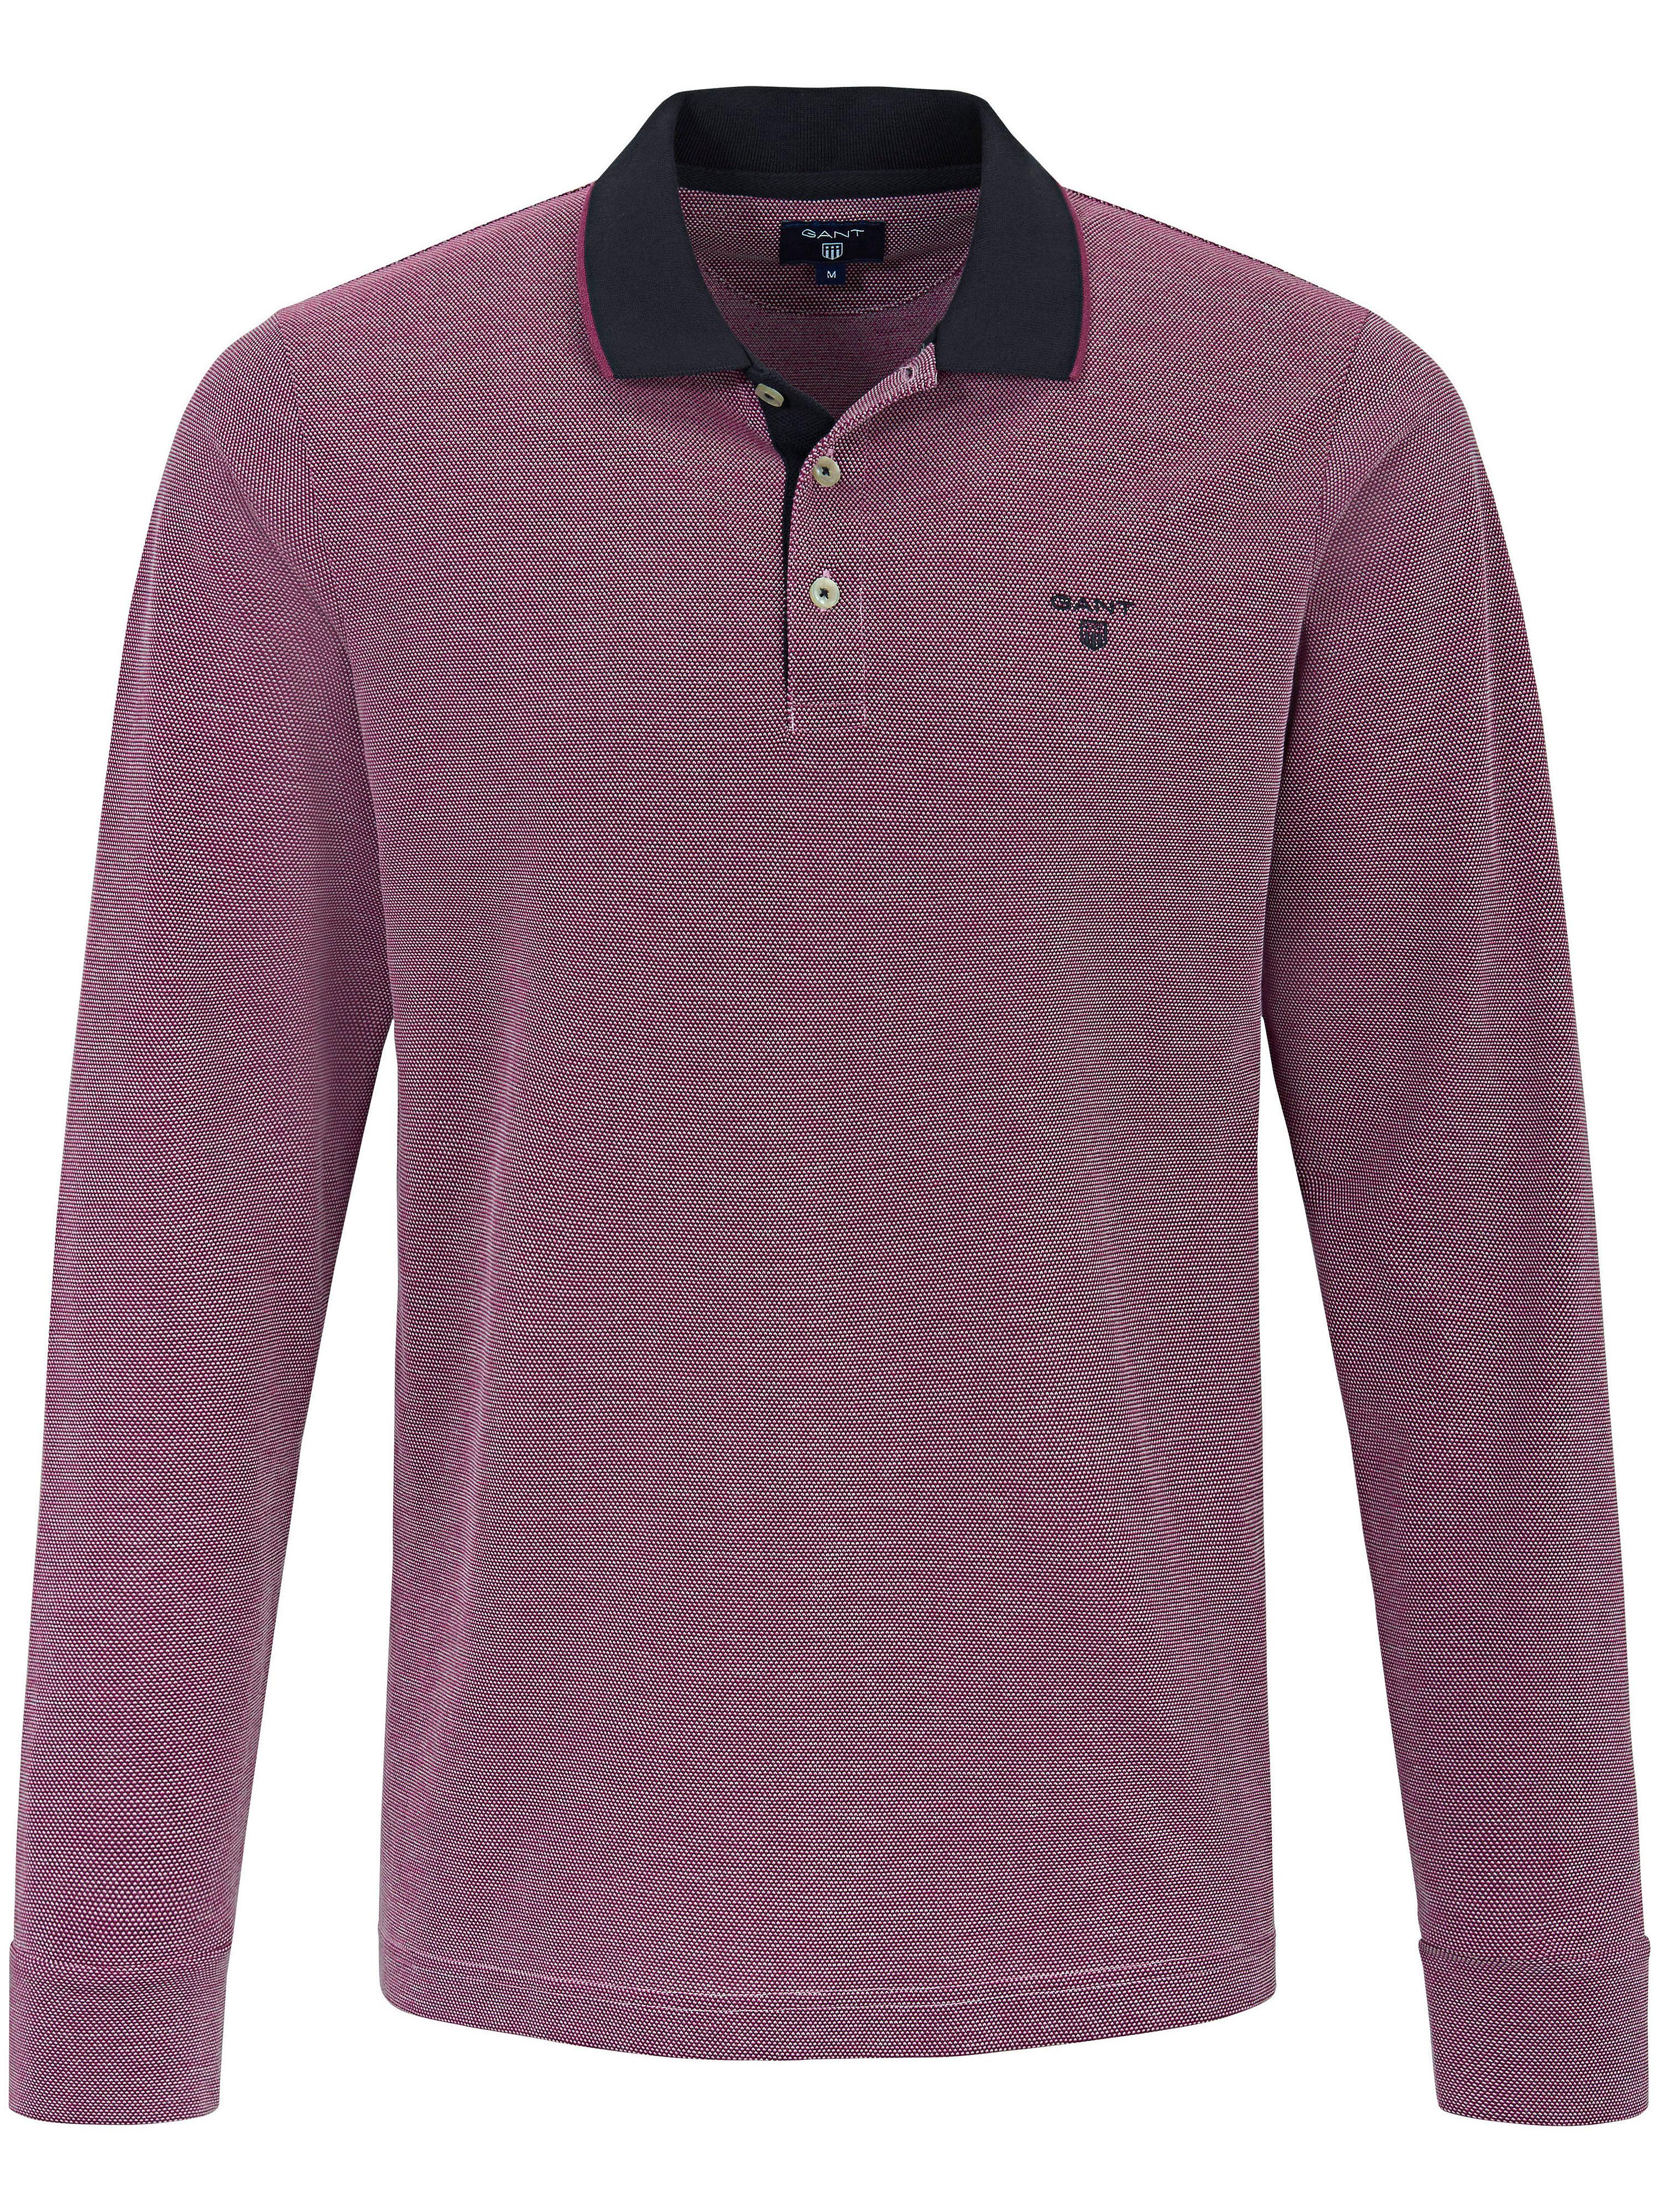 Image of   Poloshirt i sporty designerstil Fra GANT pink